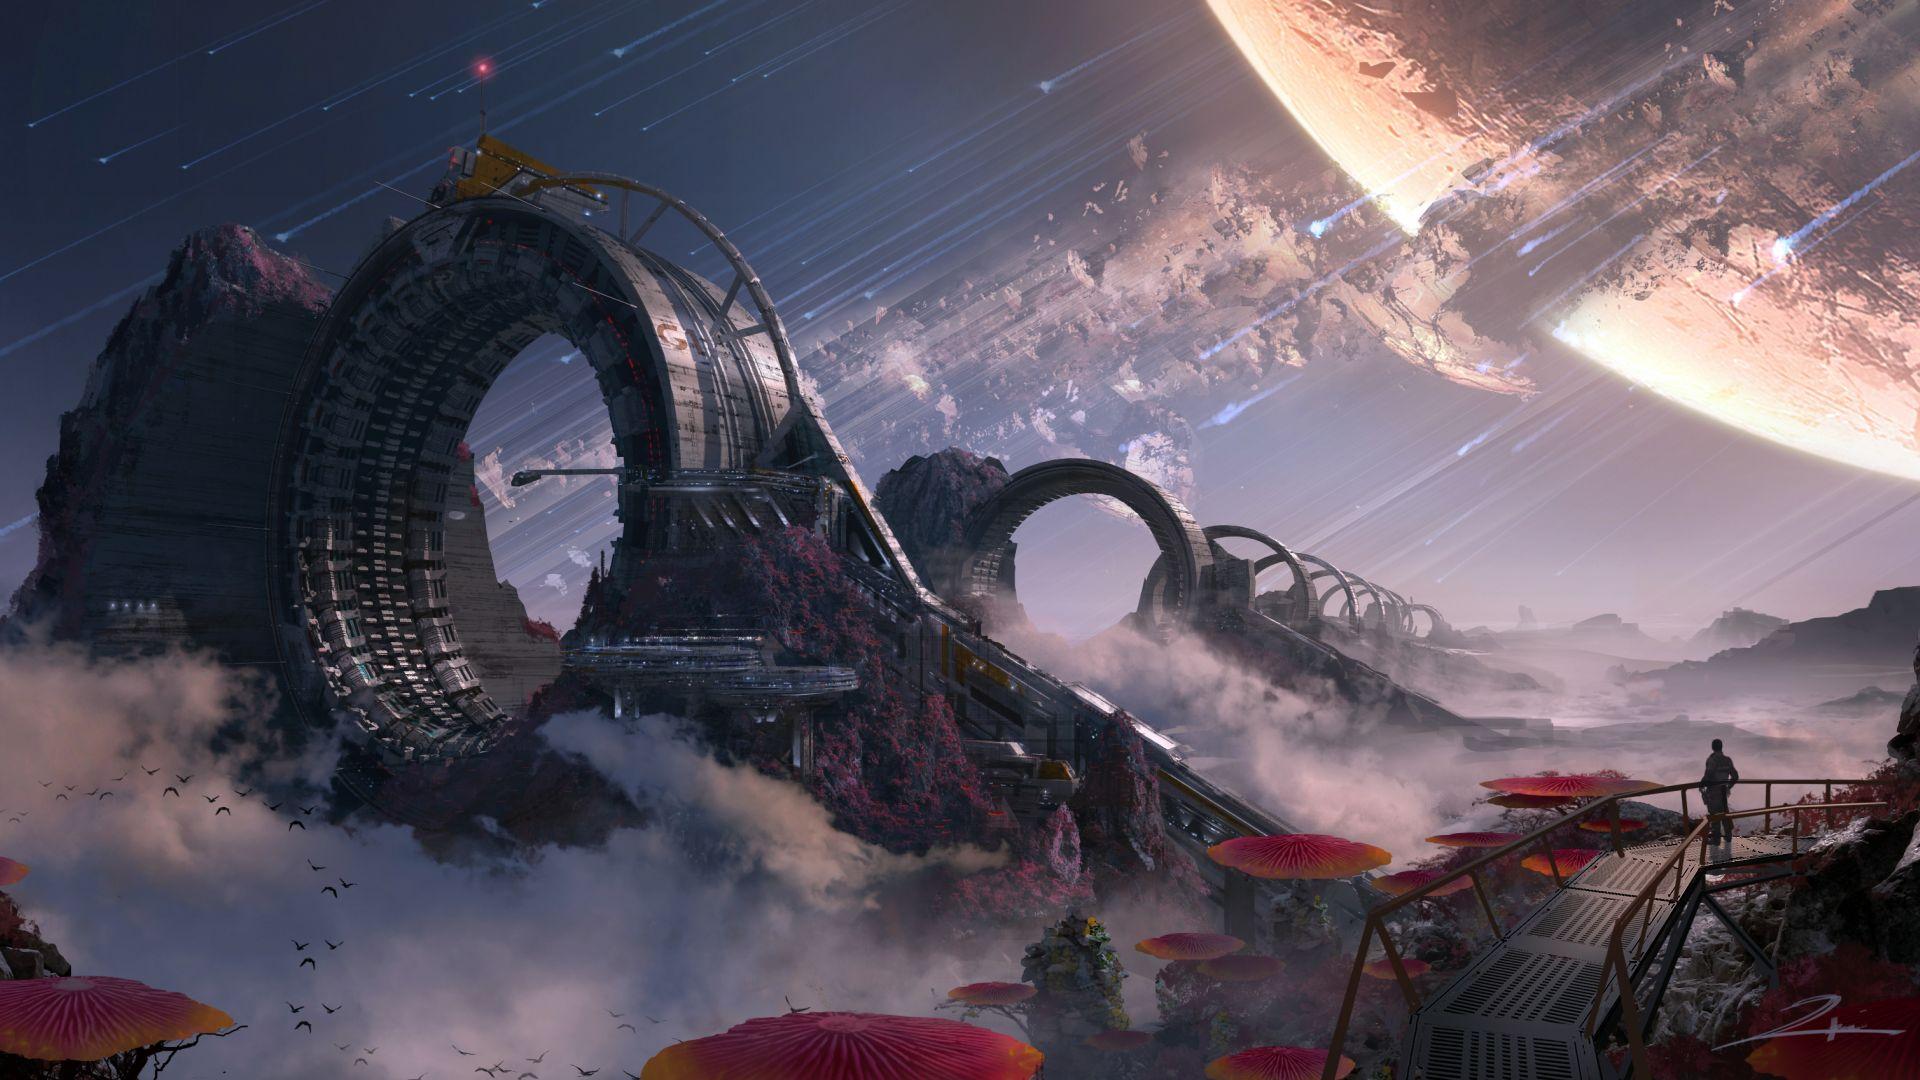 Wallpaper Titanfall 2 game concept artwork